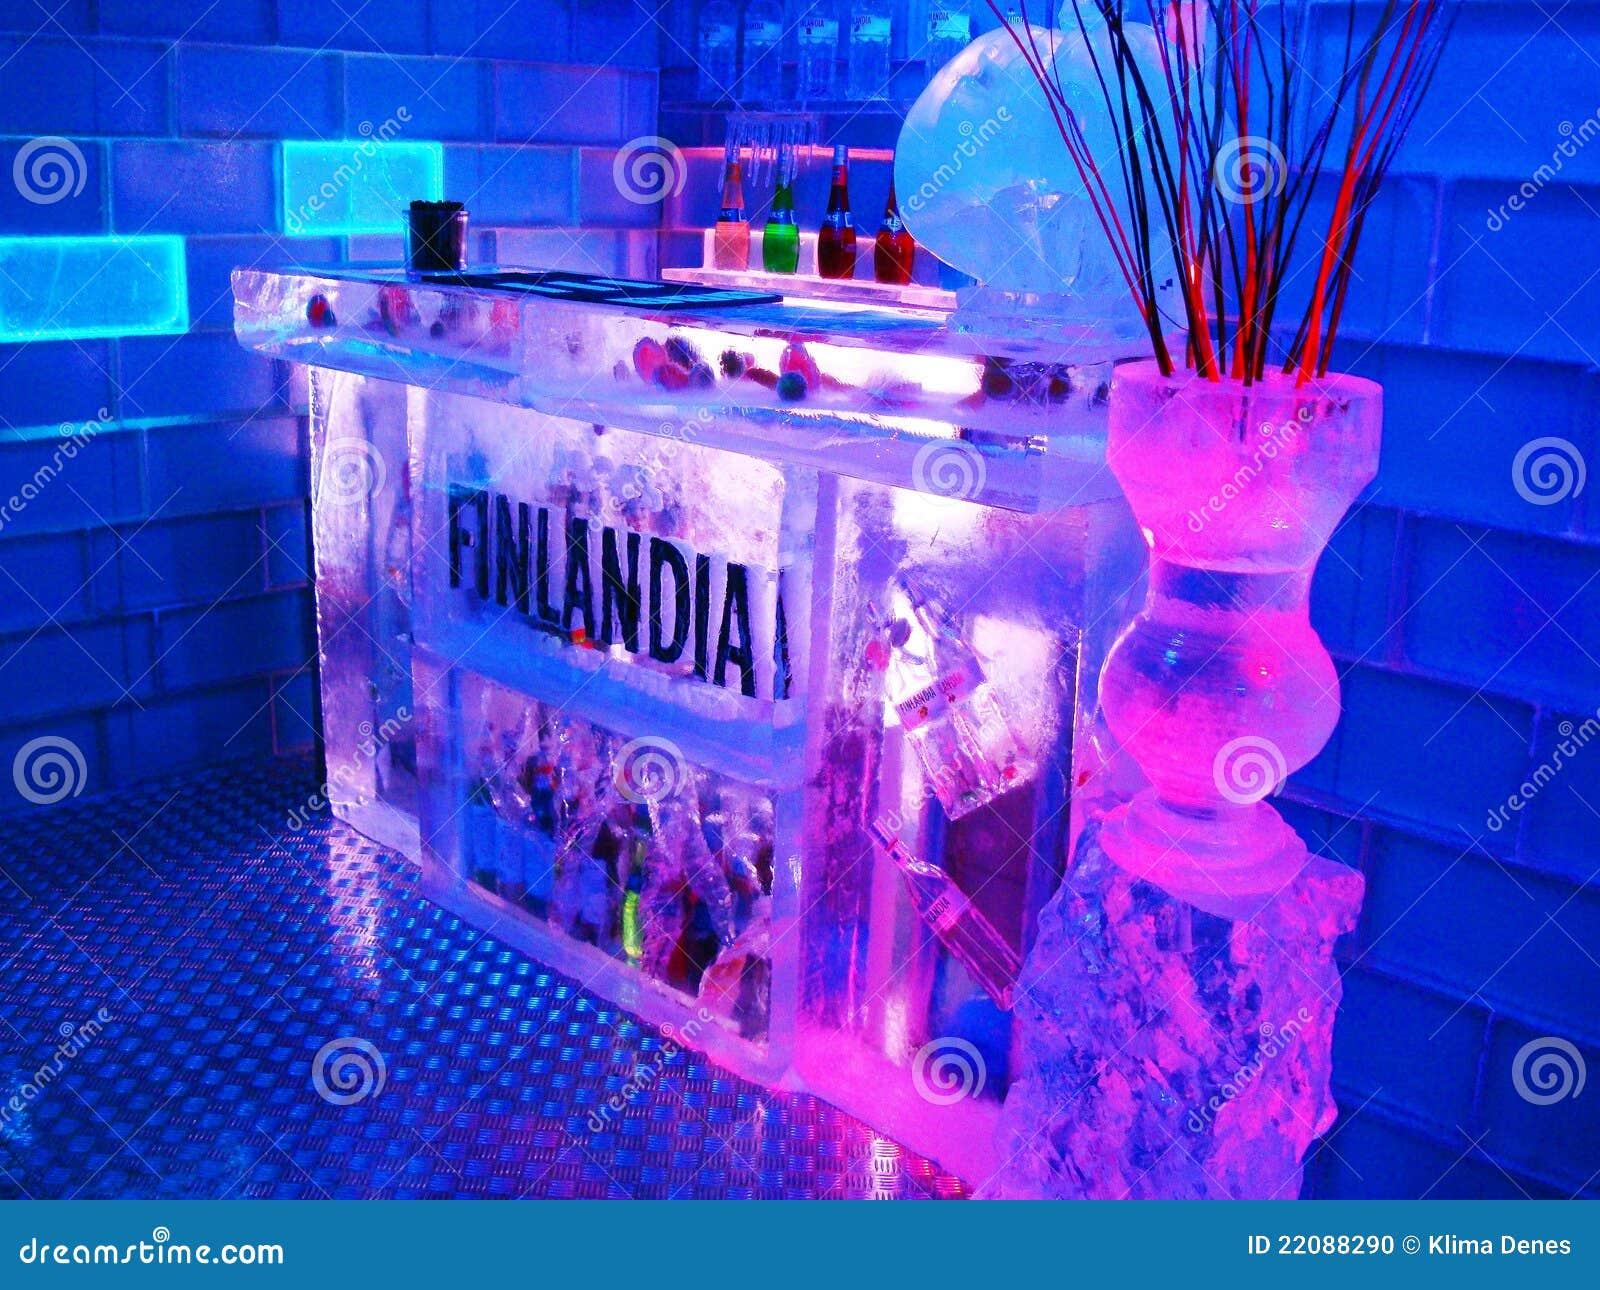 ... Navy Blue And Pink Wedding Decorations. on nightclub floor plan design